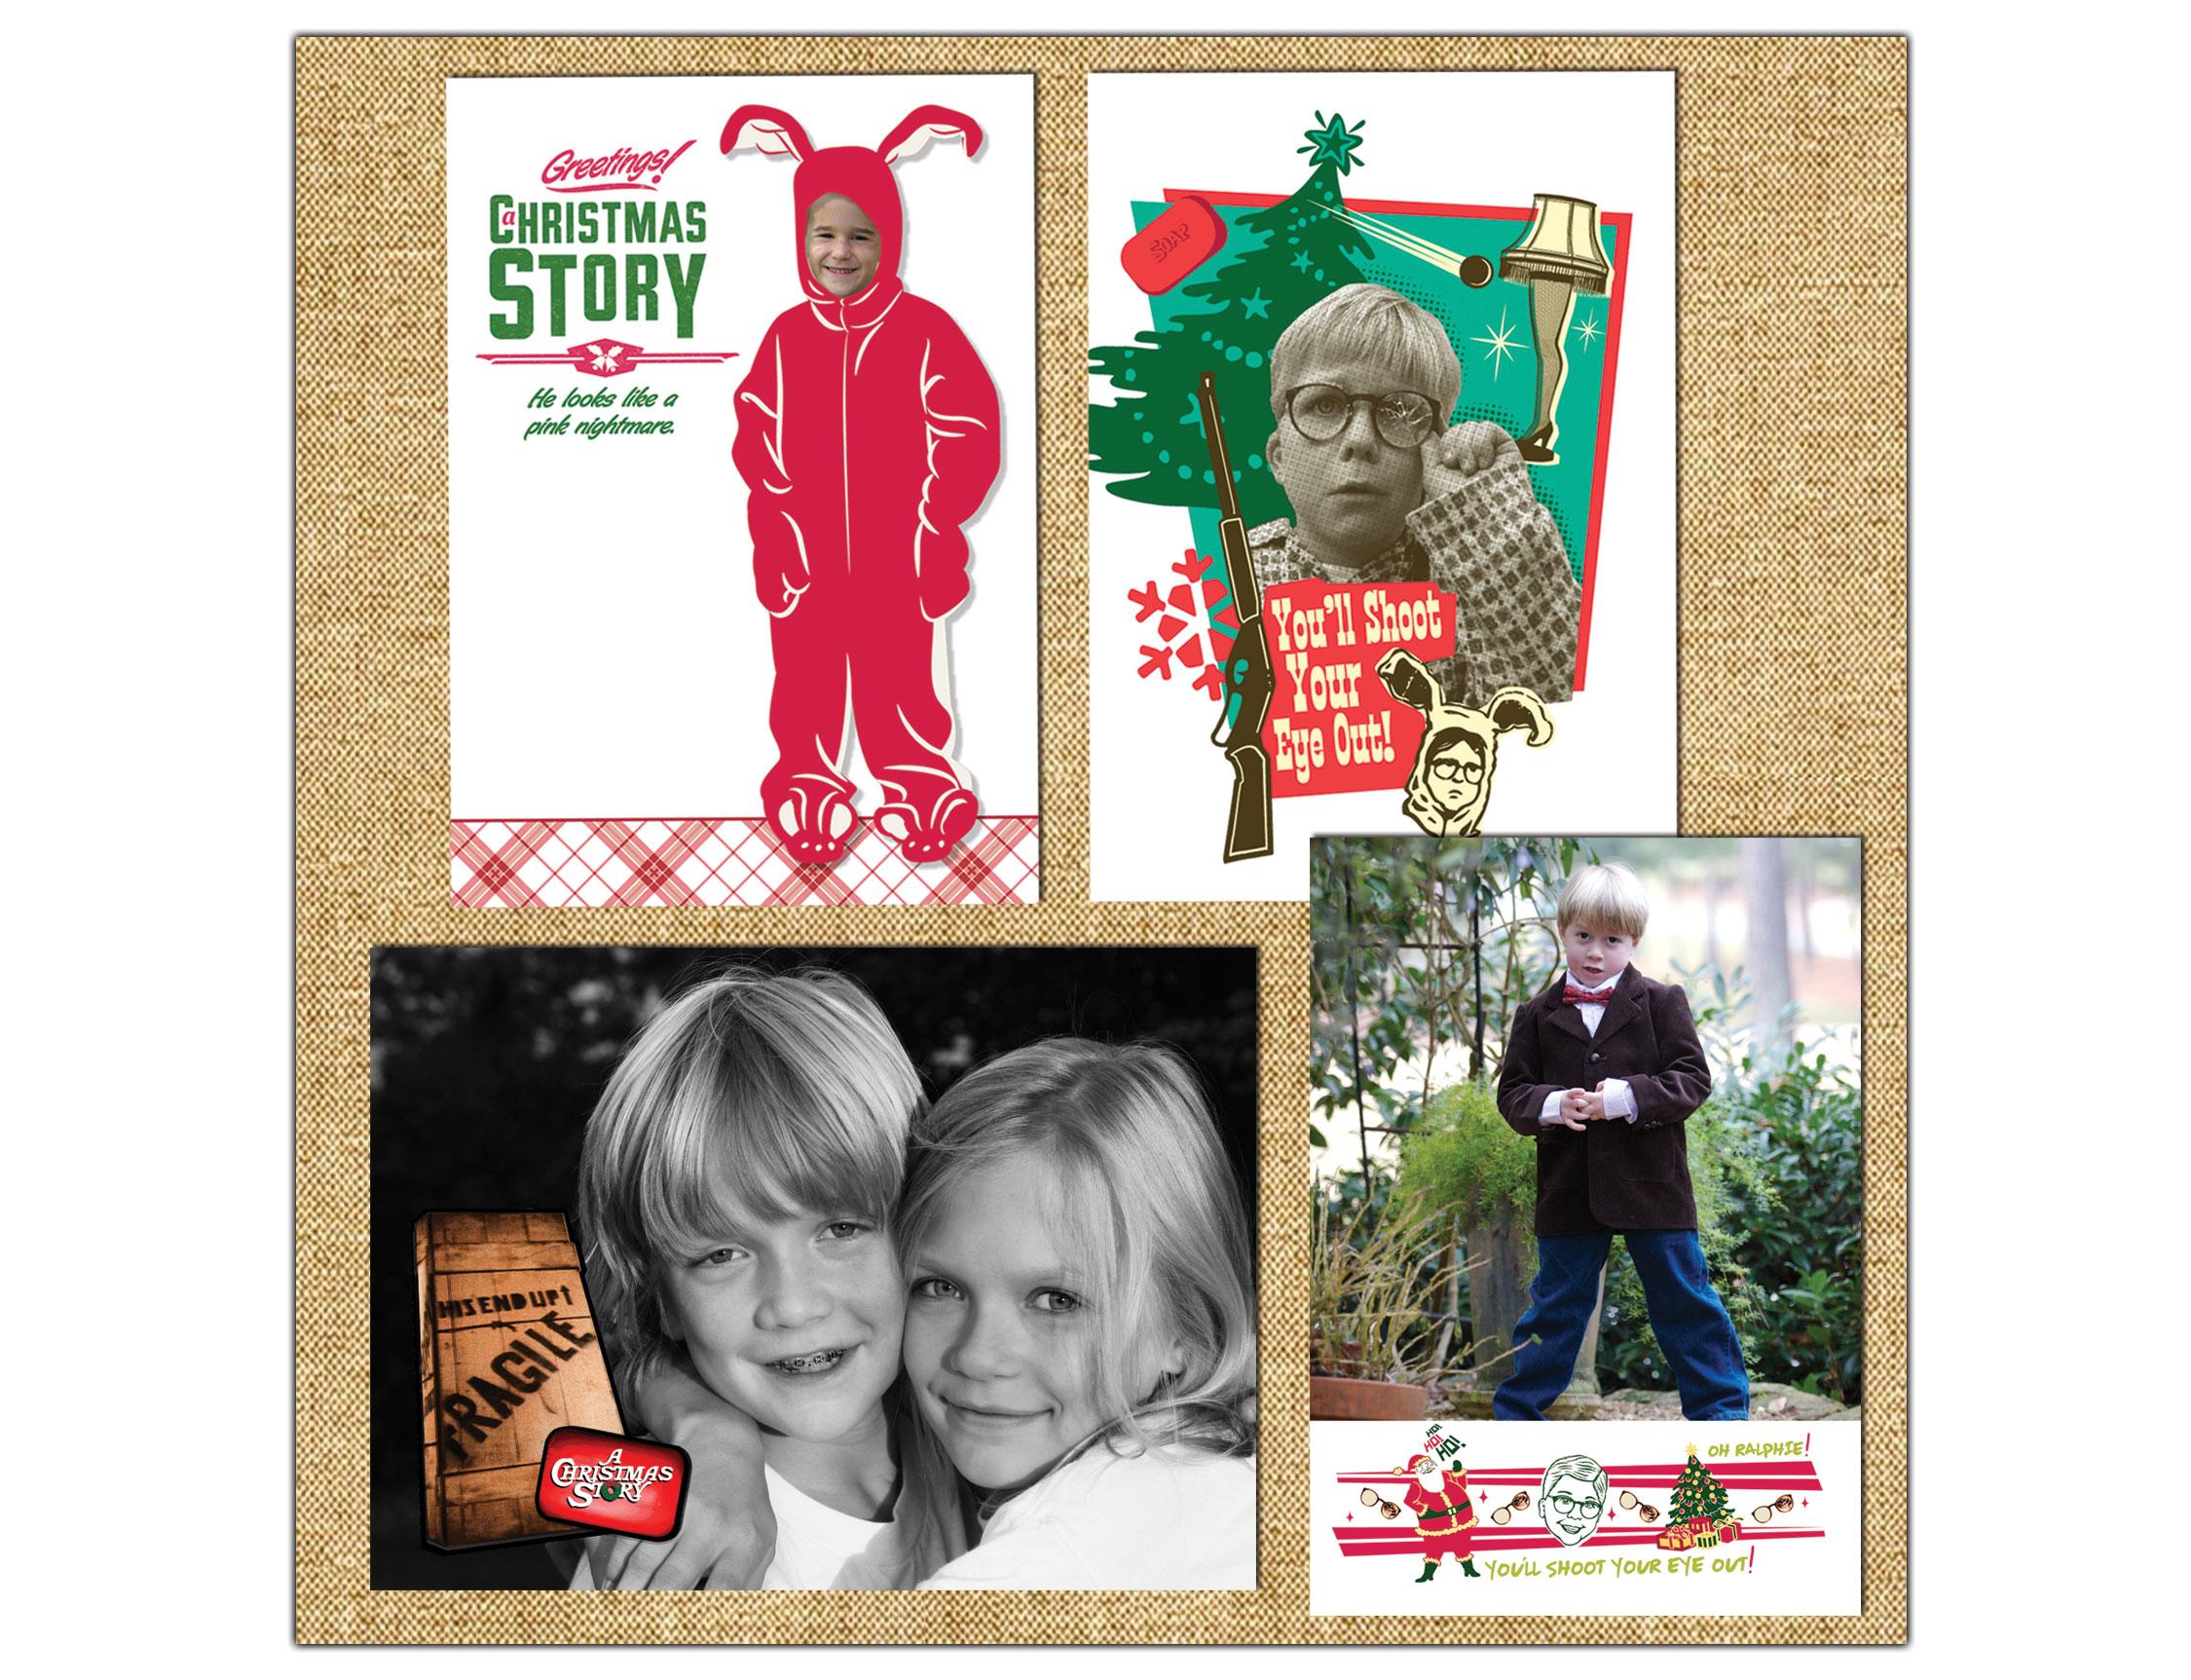 WARNER BROS HOLIDAY CARDS - A CHRISTMAS STORY \u2014 Beth Schneider